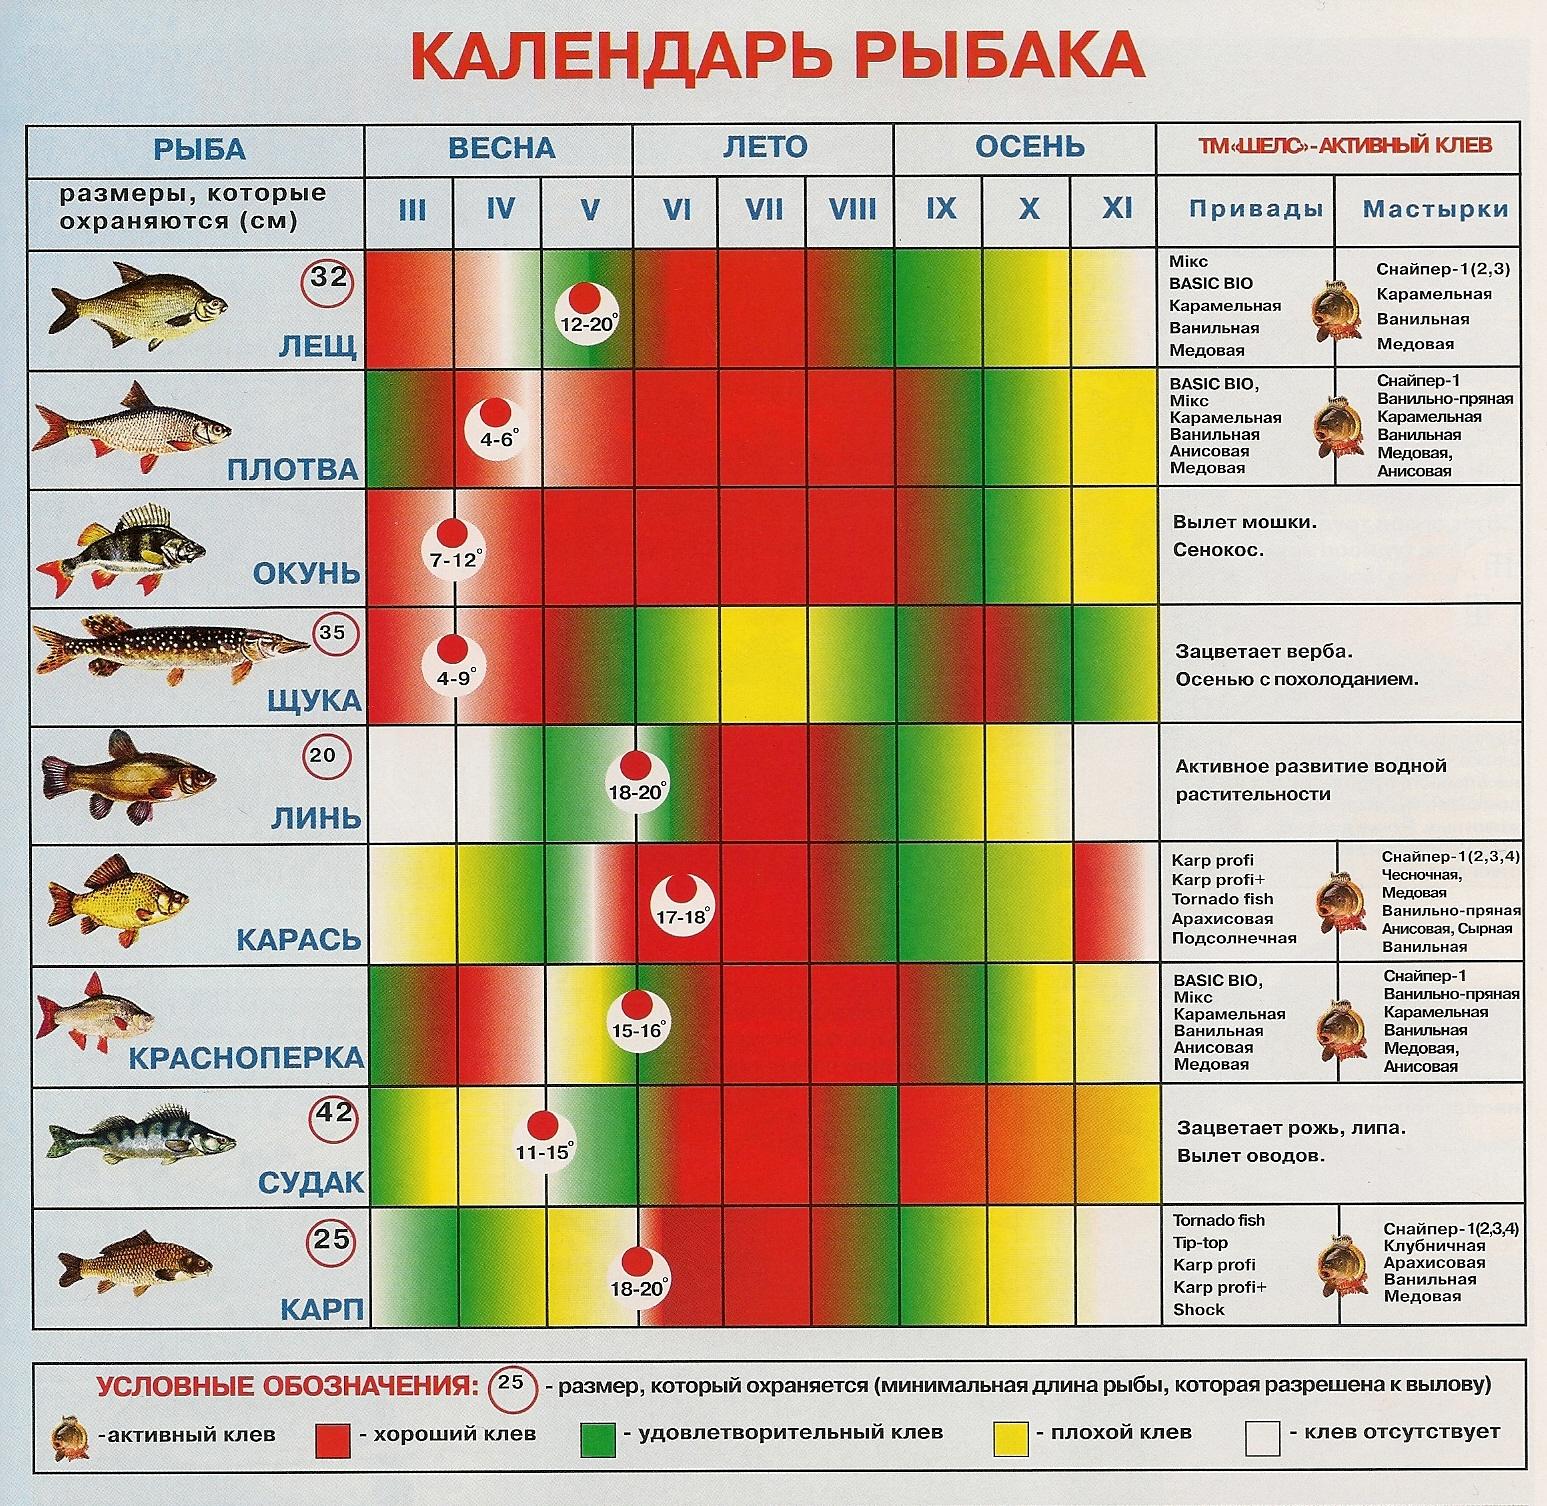 prostoi-kalendar-ribolova